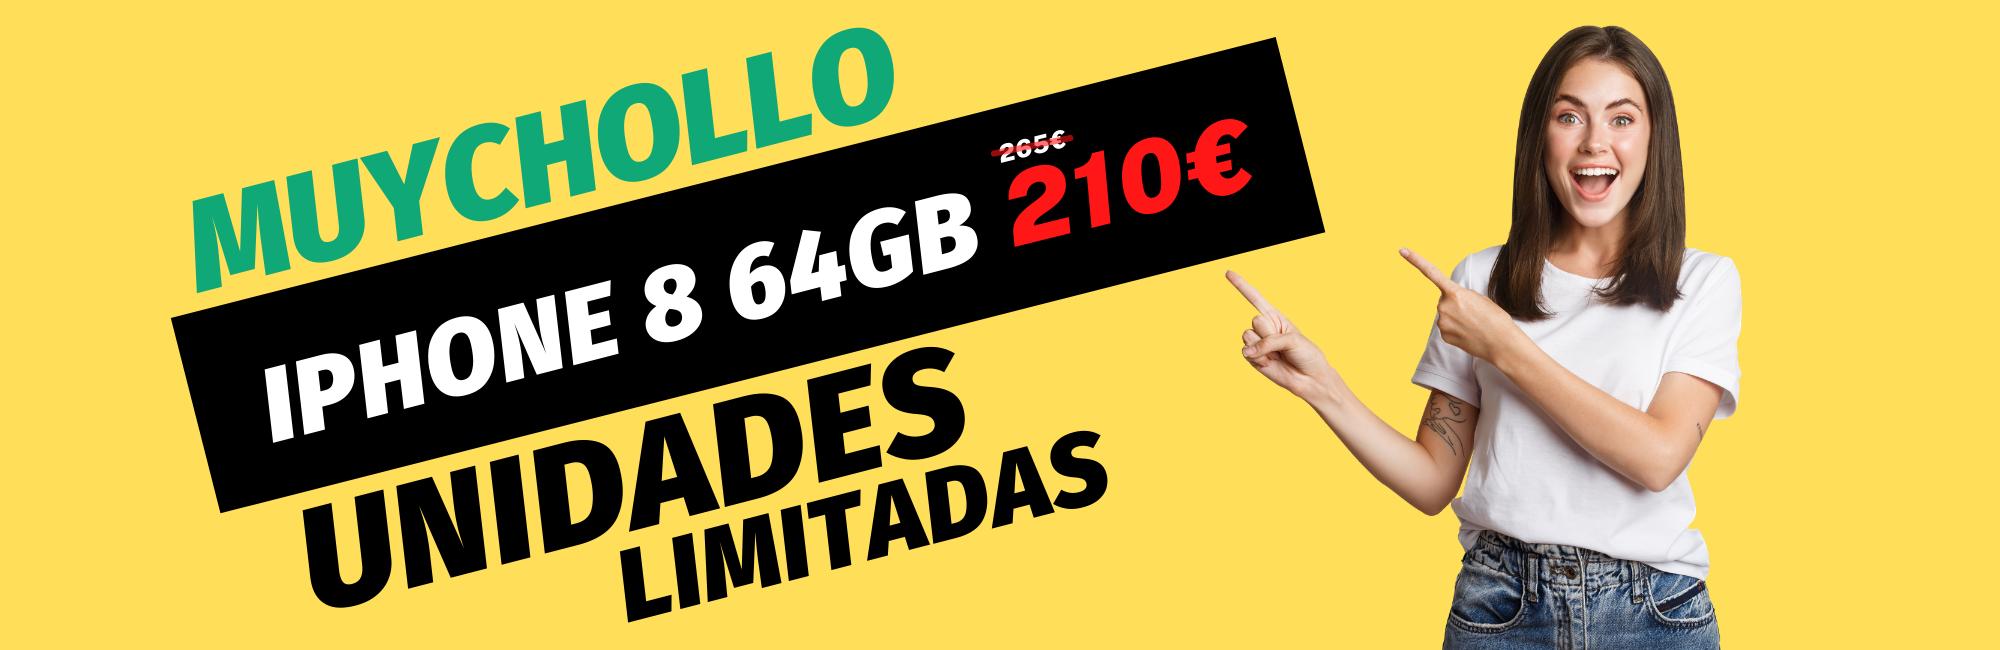 muychollo IPHONE 8 64GB